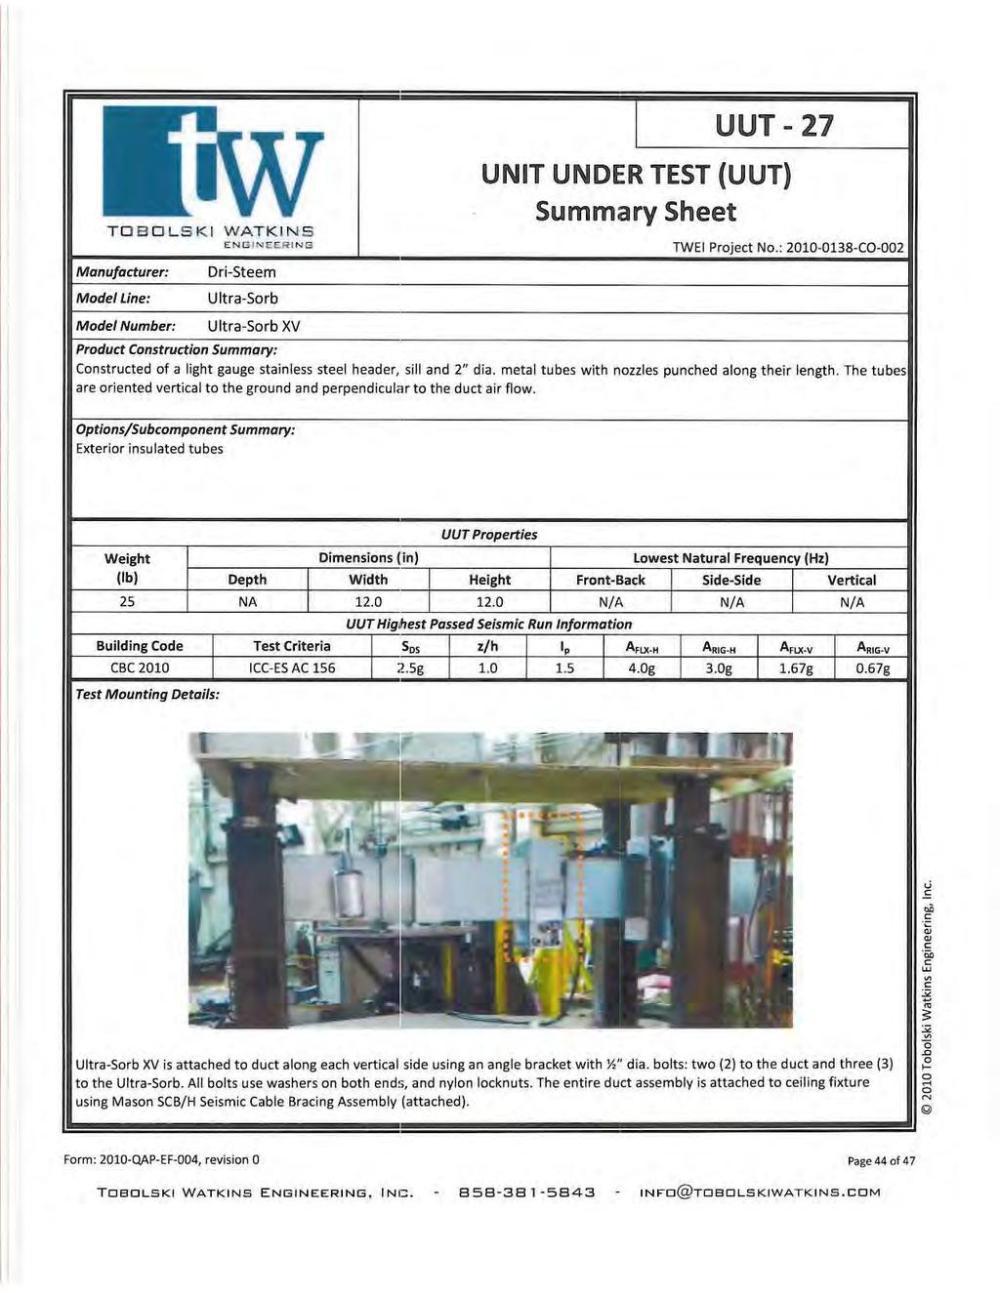 medium resolution of t obolski watkin s eno inet r n g manufacturer mode line